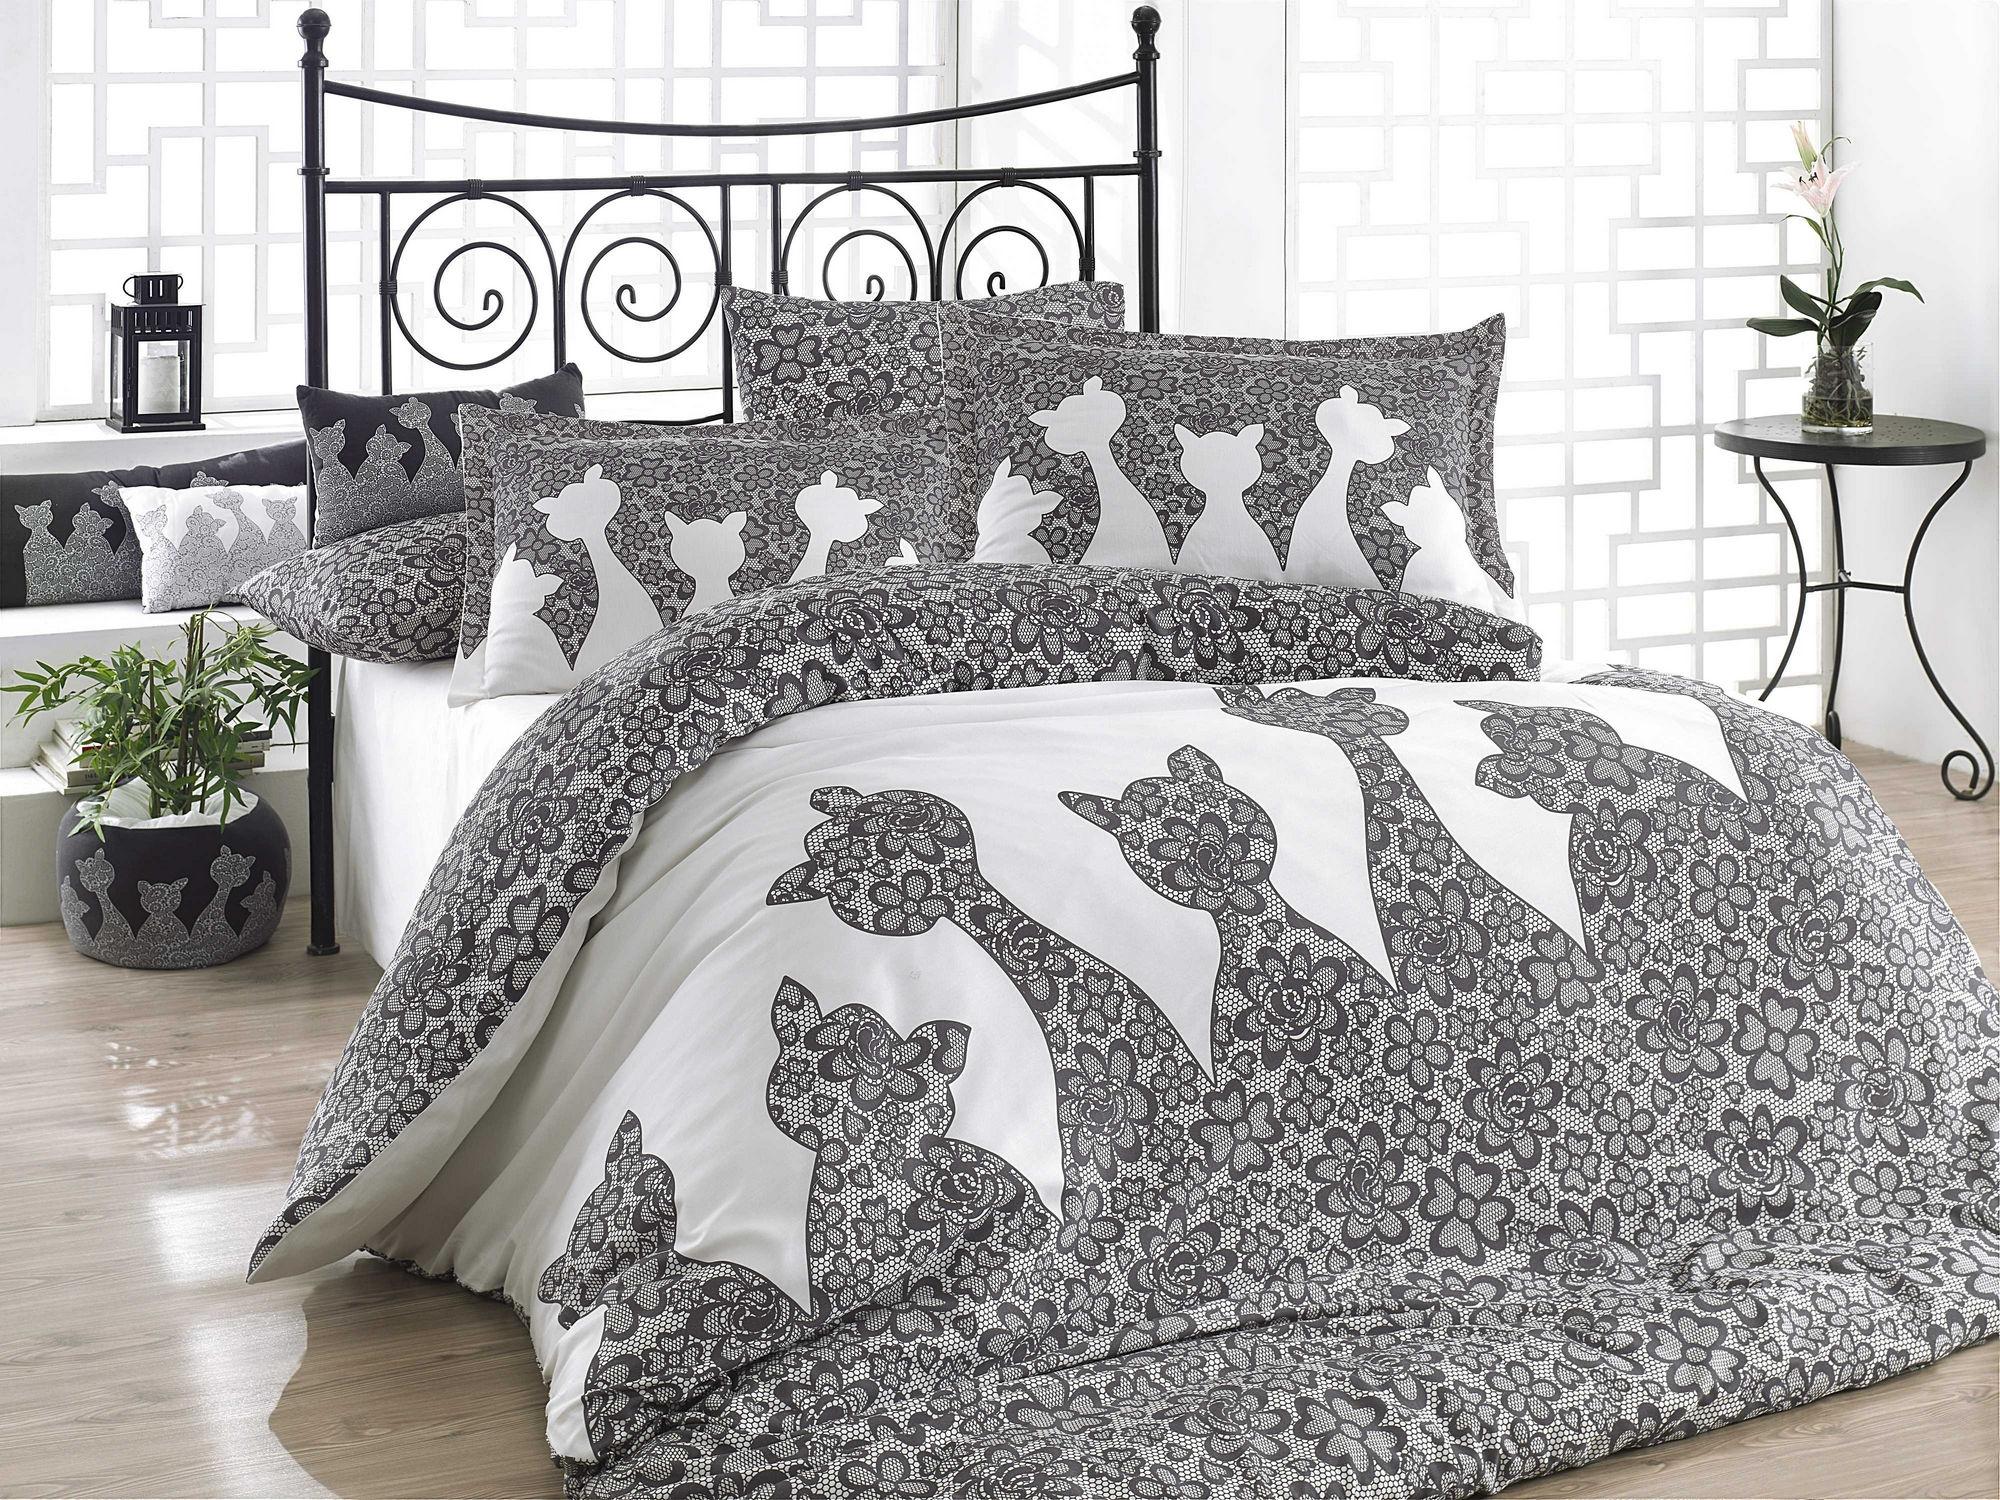 Lenjerie de pat din bumbac Jazz Negru / Alb, 200 x 220 cm imagine